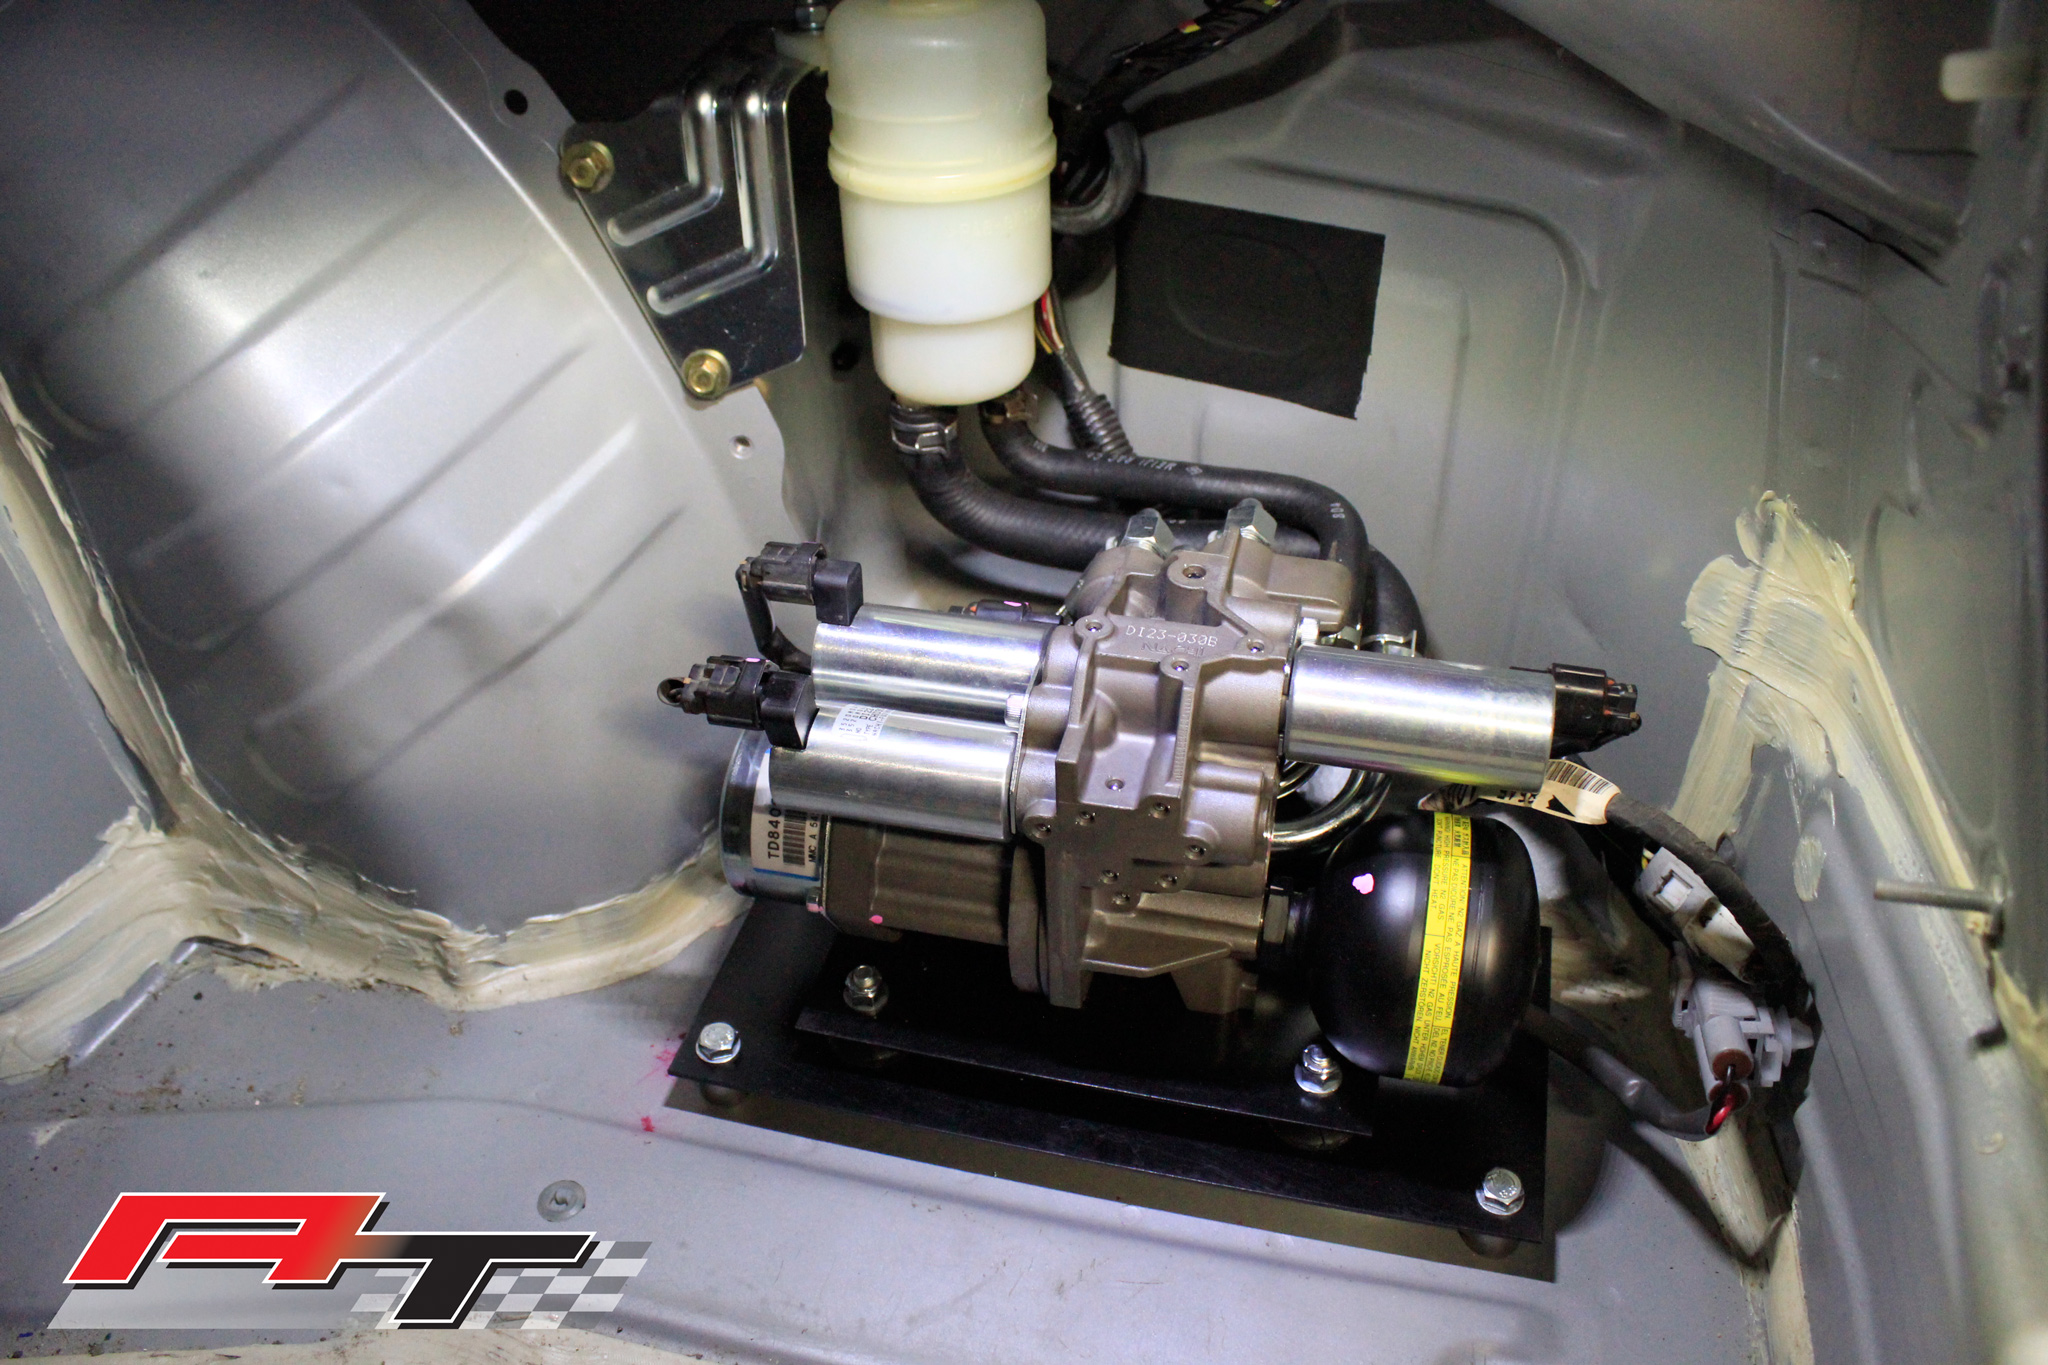 Awd Cars For Sale >> Evo X AYC relocation kit - Auto Torque - Auto Torque